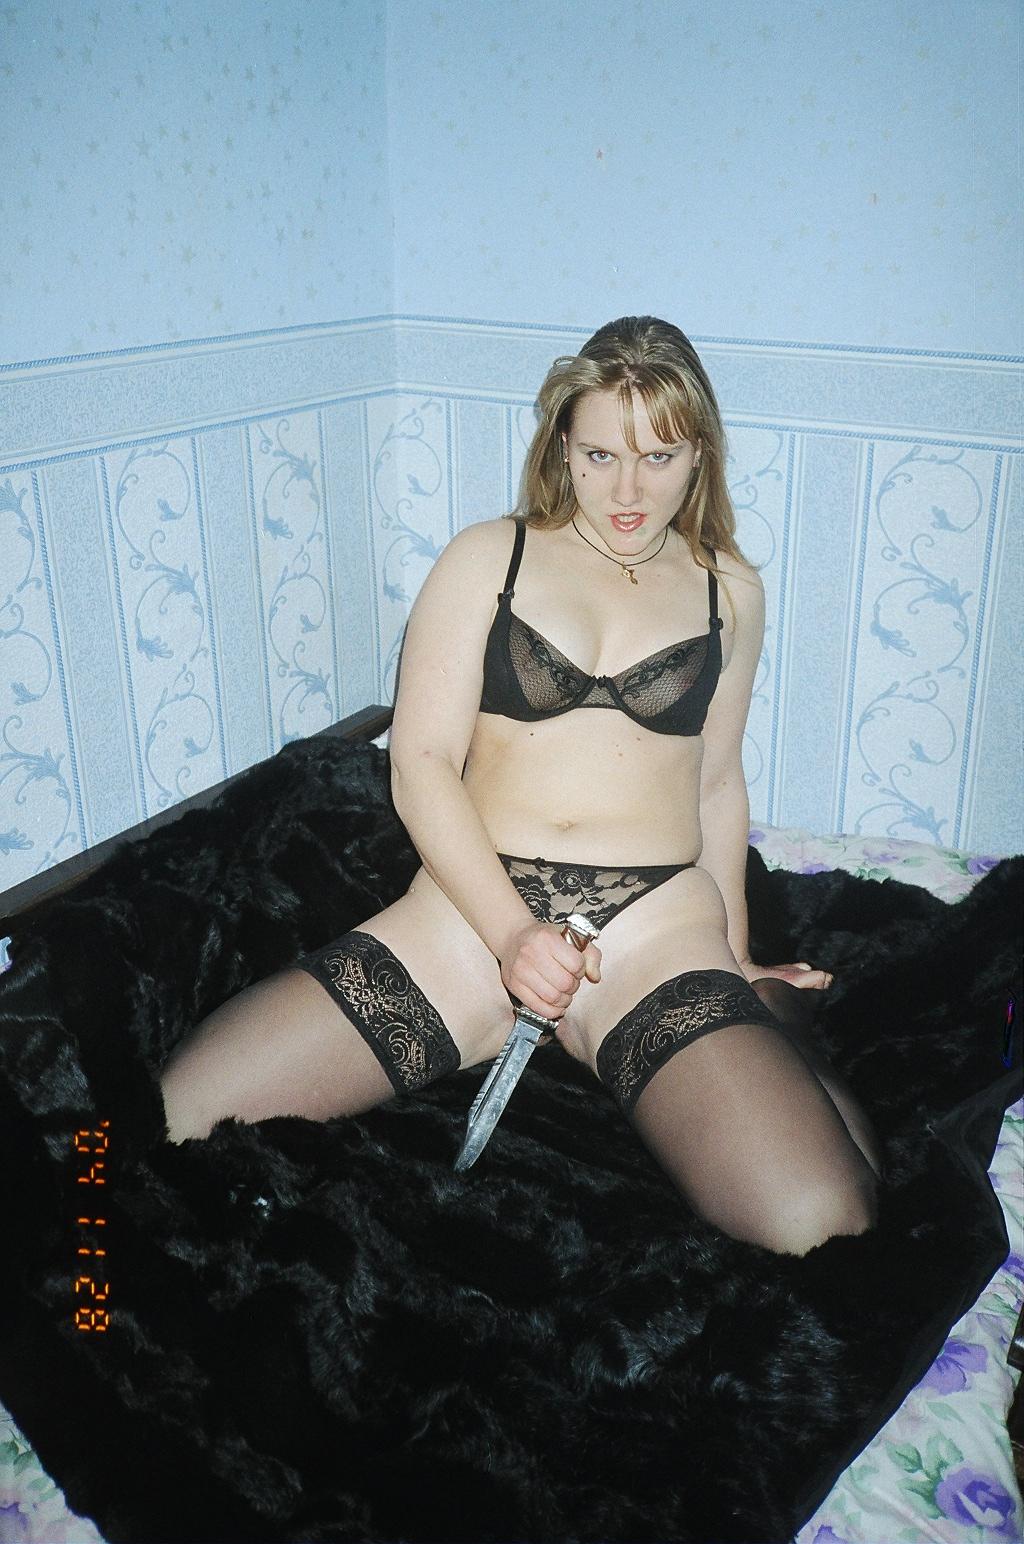 Садо мазо порно в чулках 2 фотография